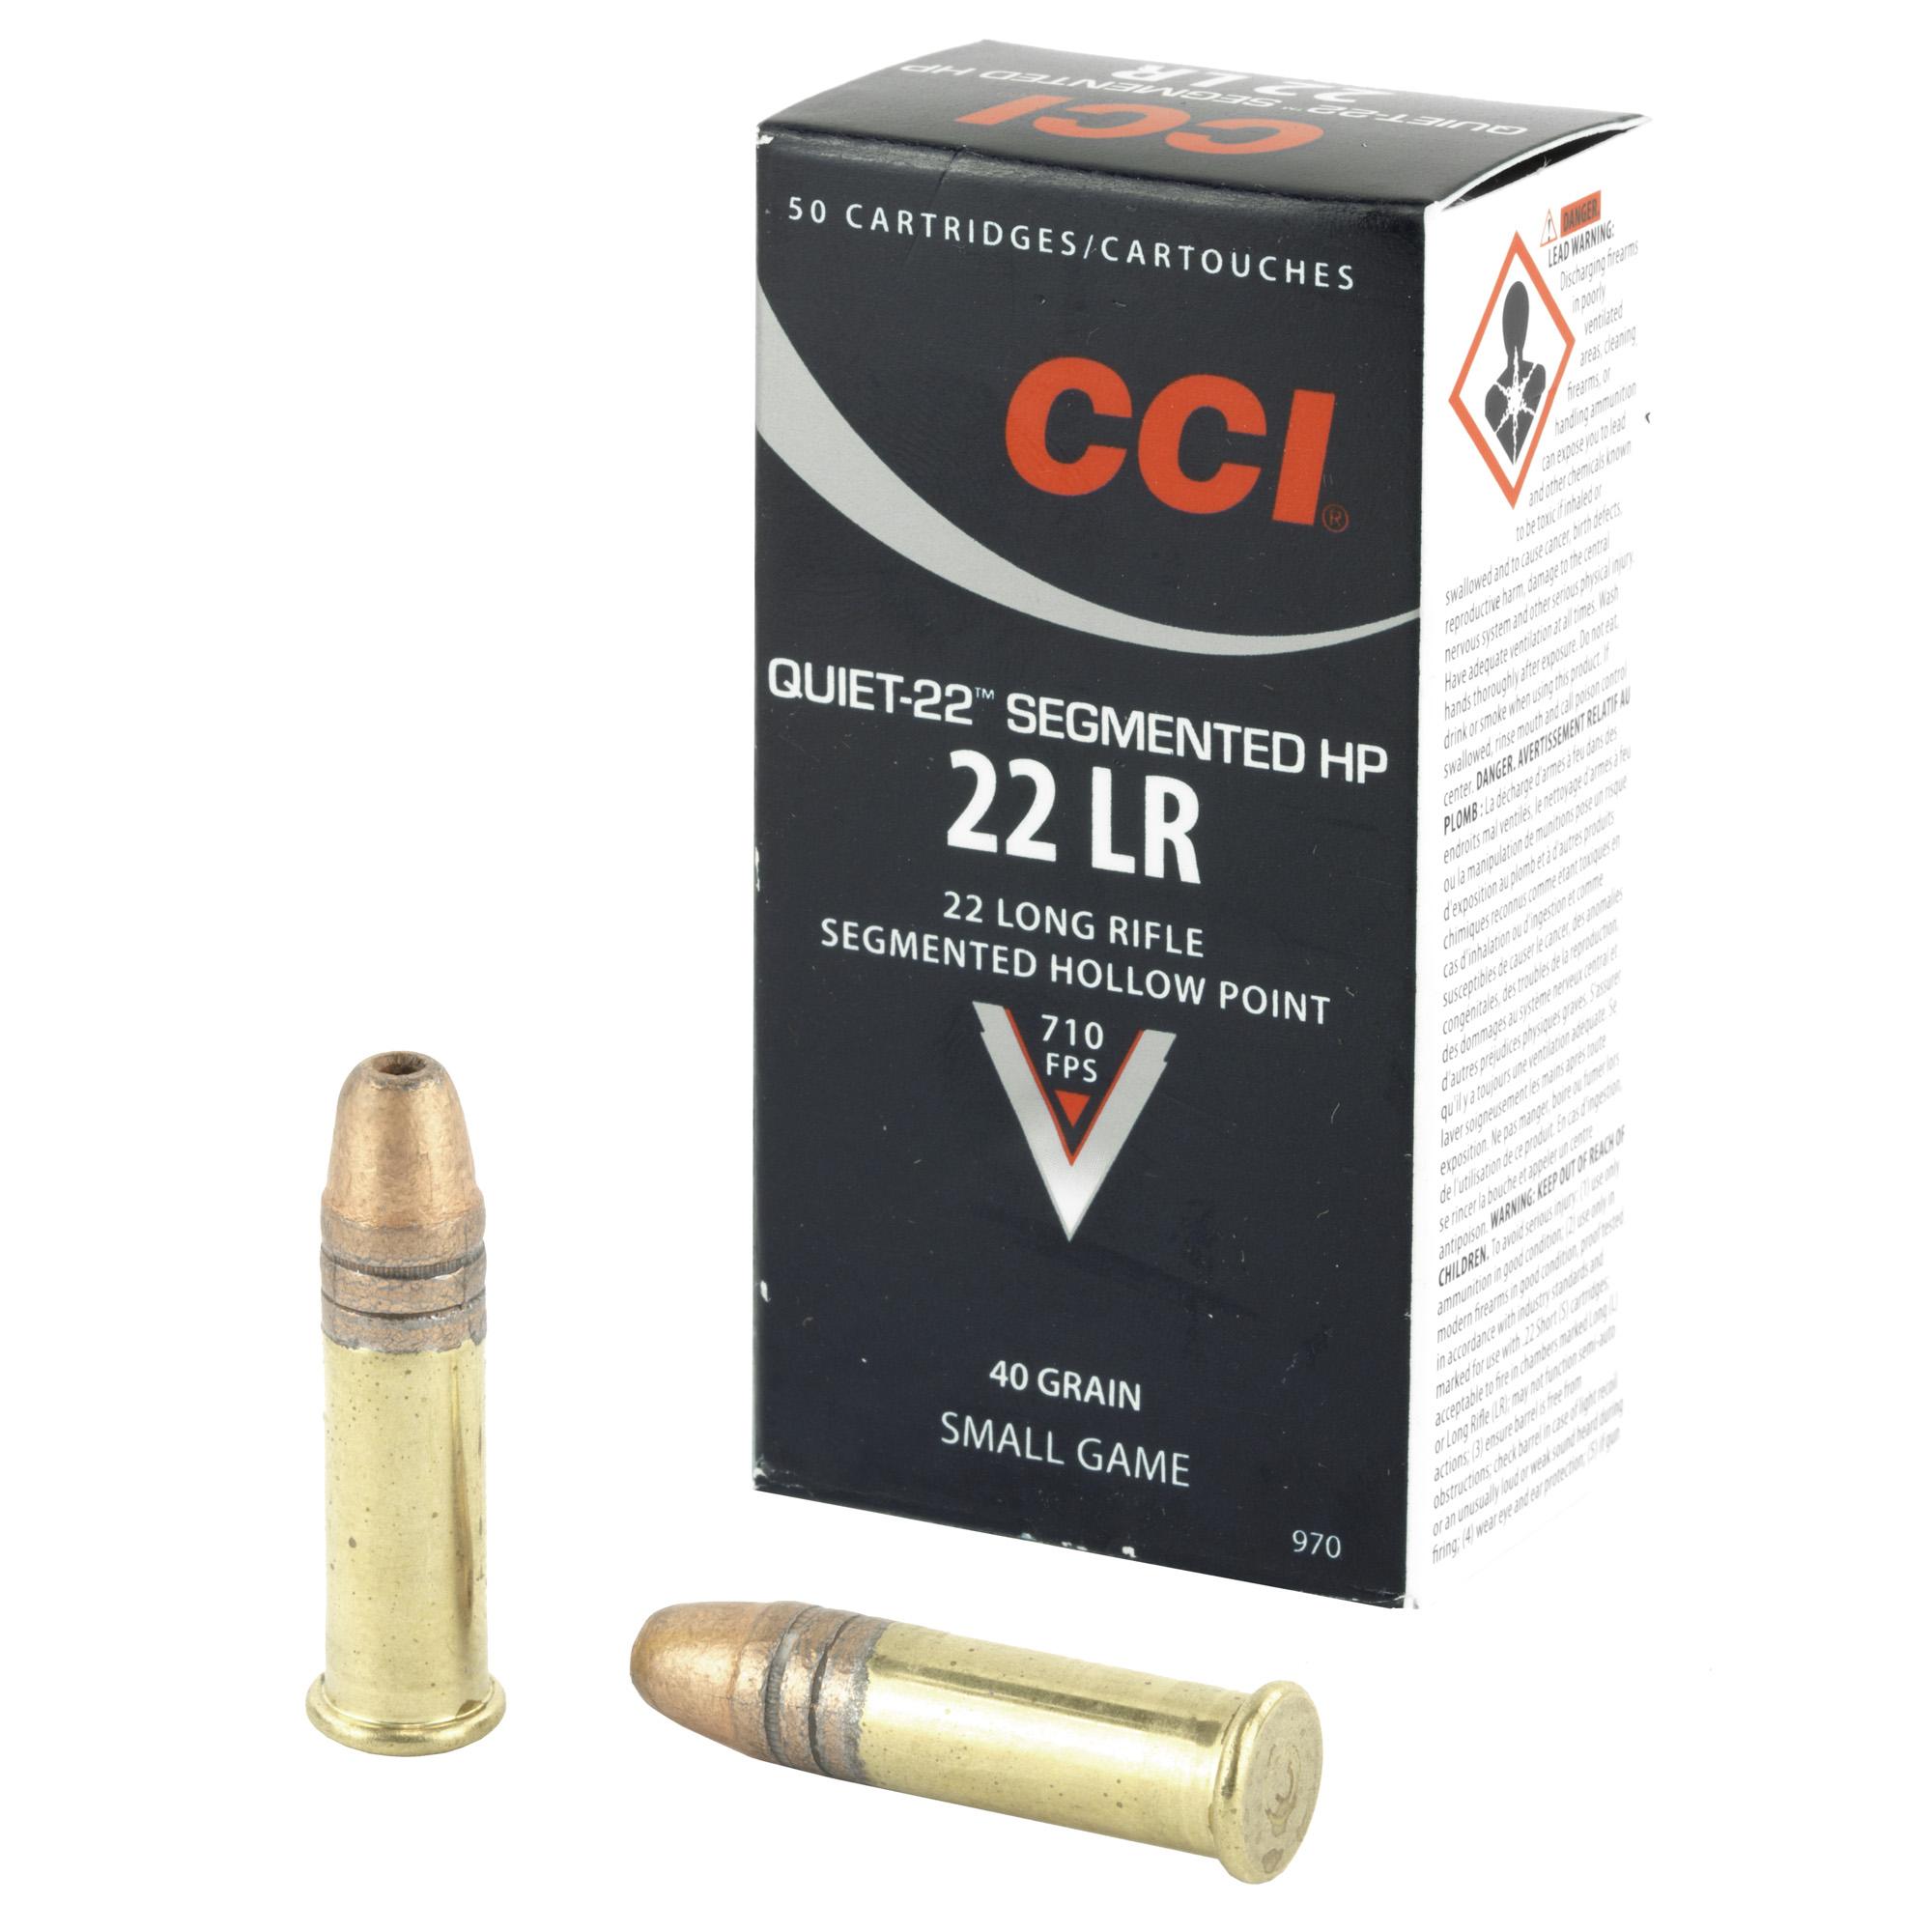 Cci Quiet Segmented 22lr 40gr Hp 50/